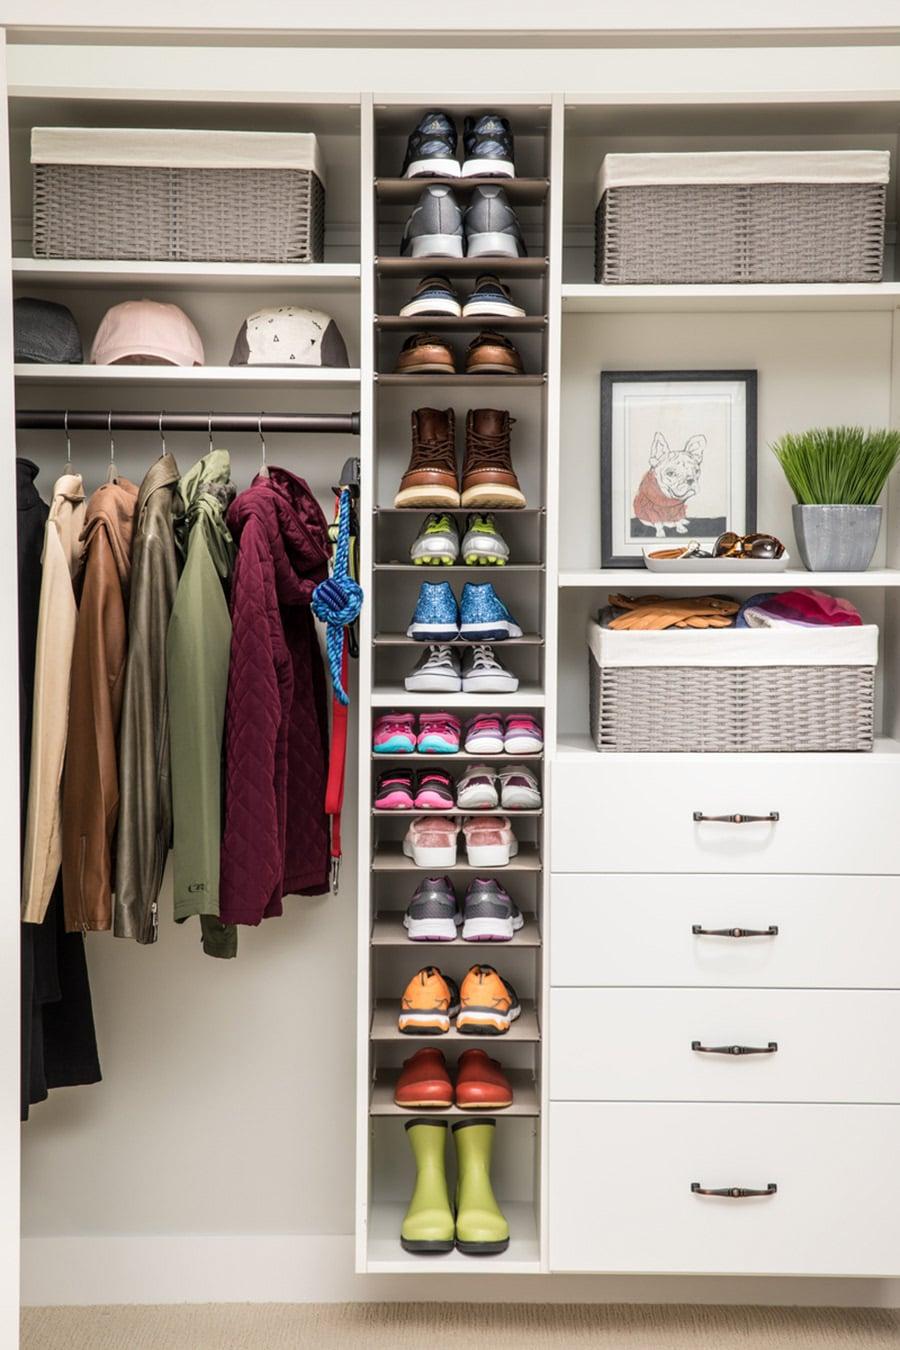 Feature 4 drawers in a reach in closet marysville ohio | Columbus Ohio | #ClosetOrganization #StorageOptions #OrganizationSystems #ReachInCloset